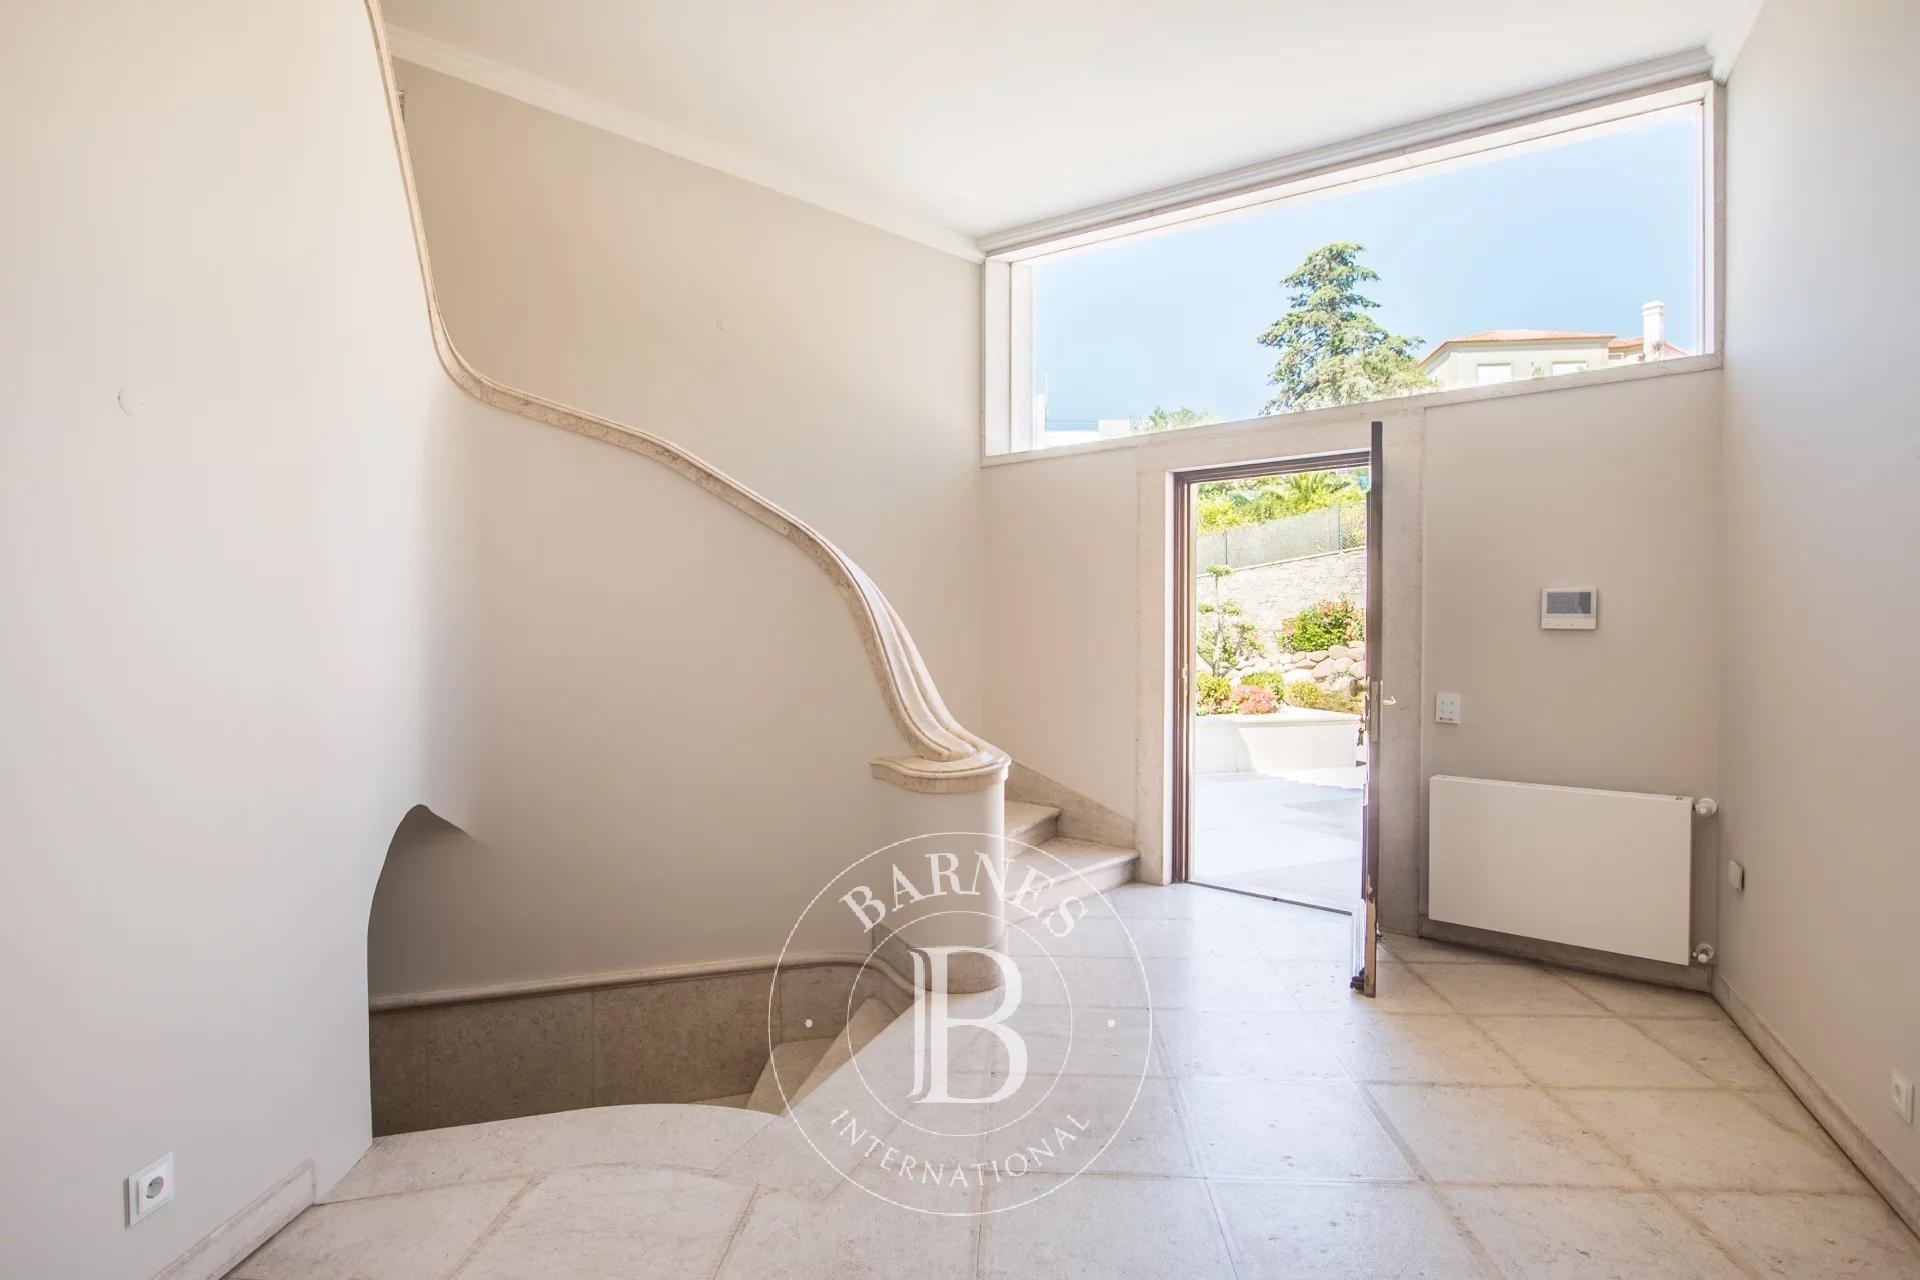 Splendid villa with 5 bedrooms